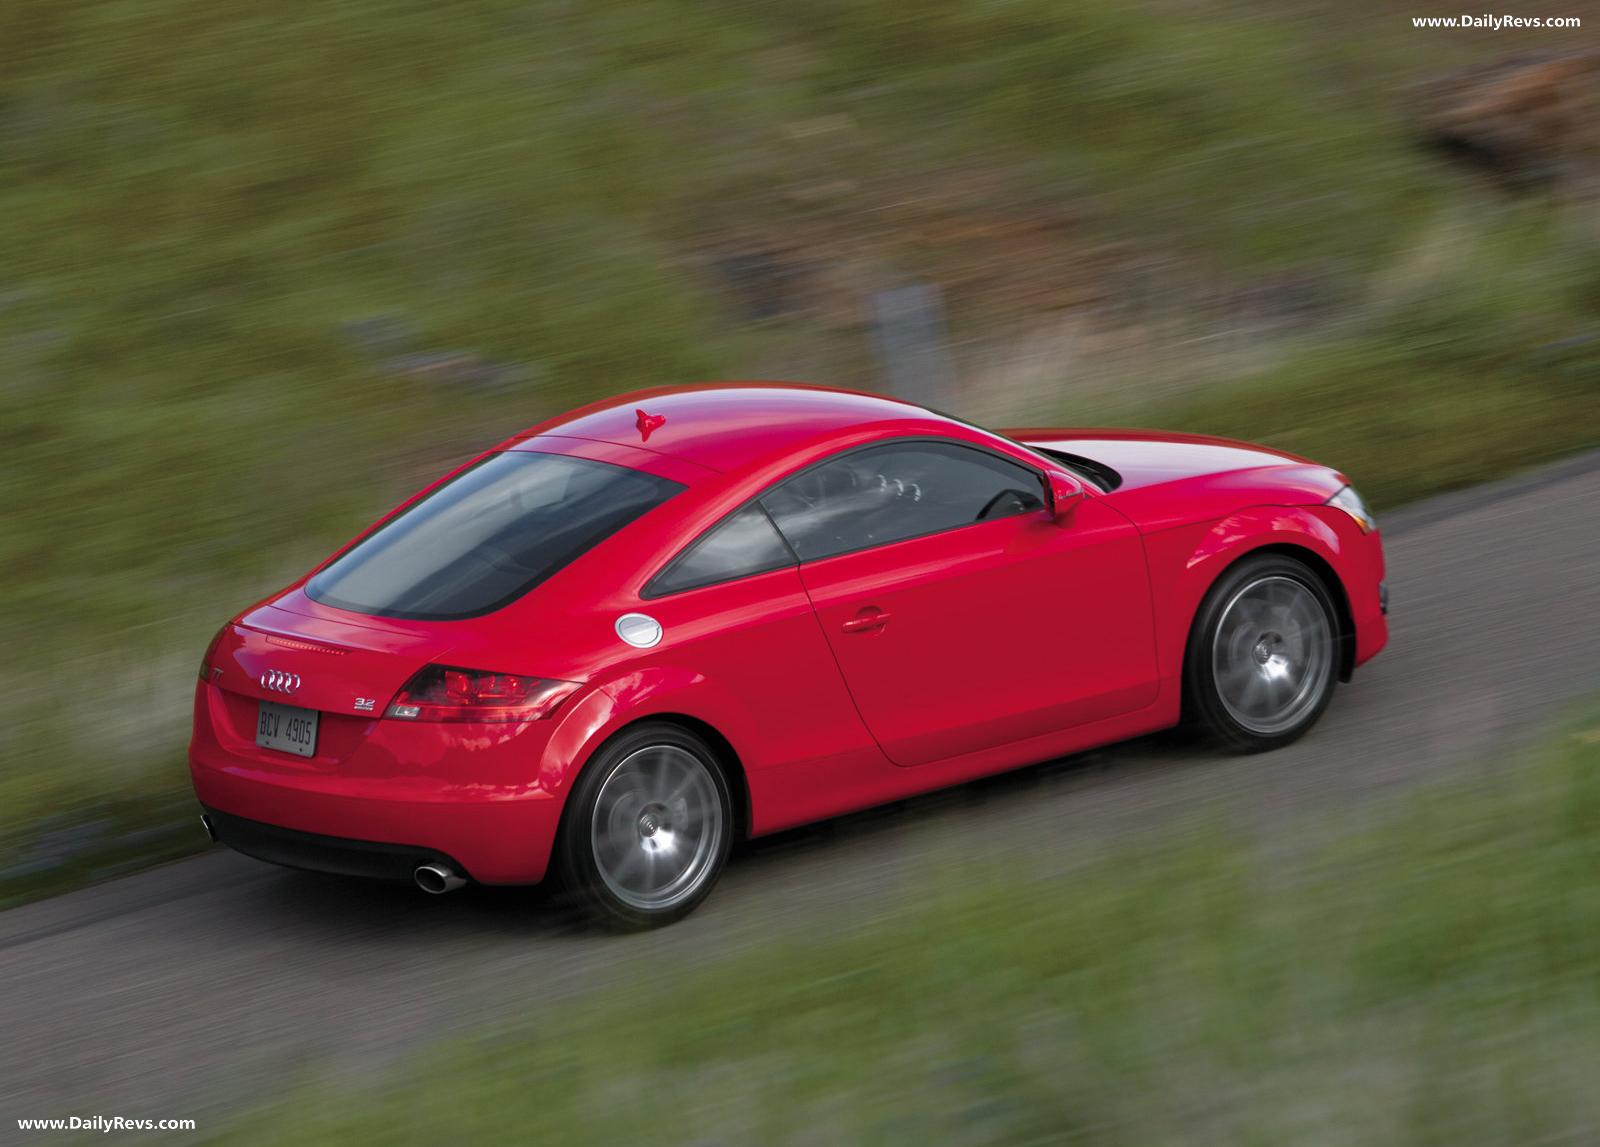 2008 Audi TT Coupe - HD Pictures, Videos, Specs ...